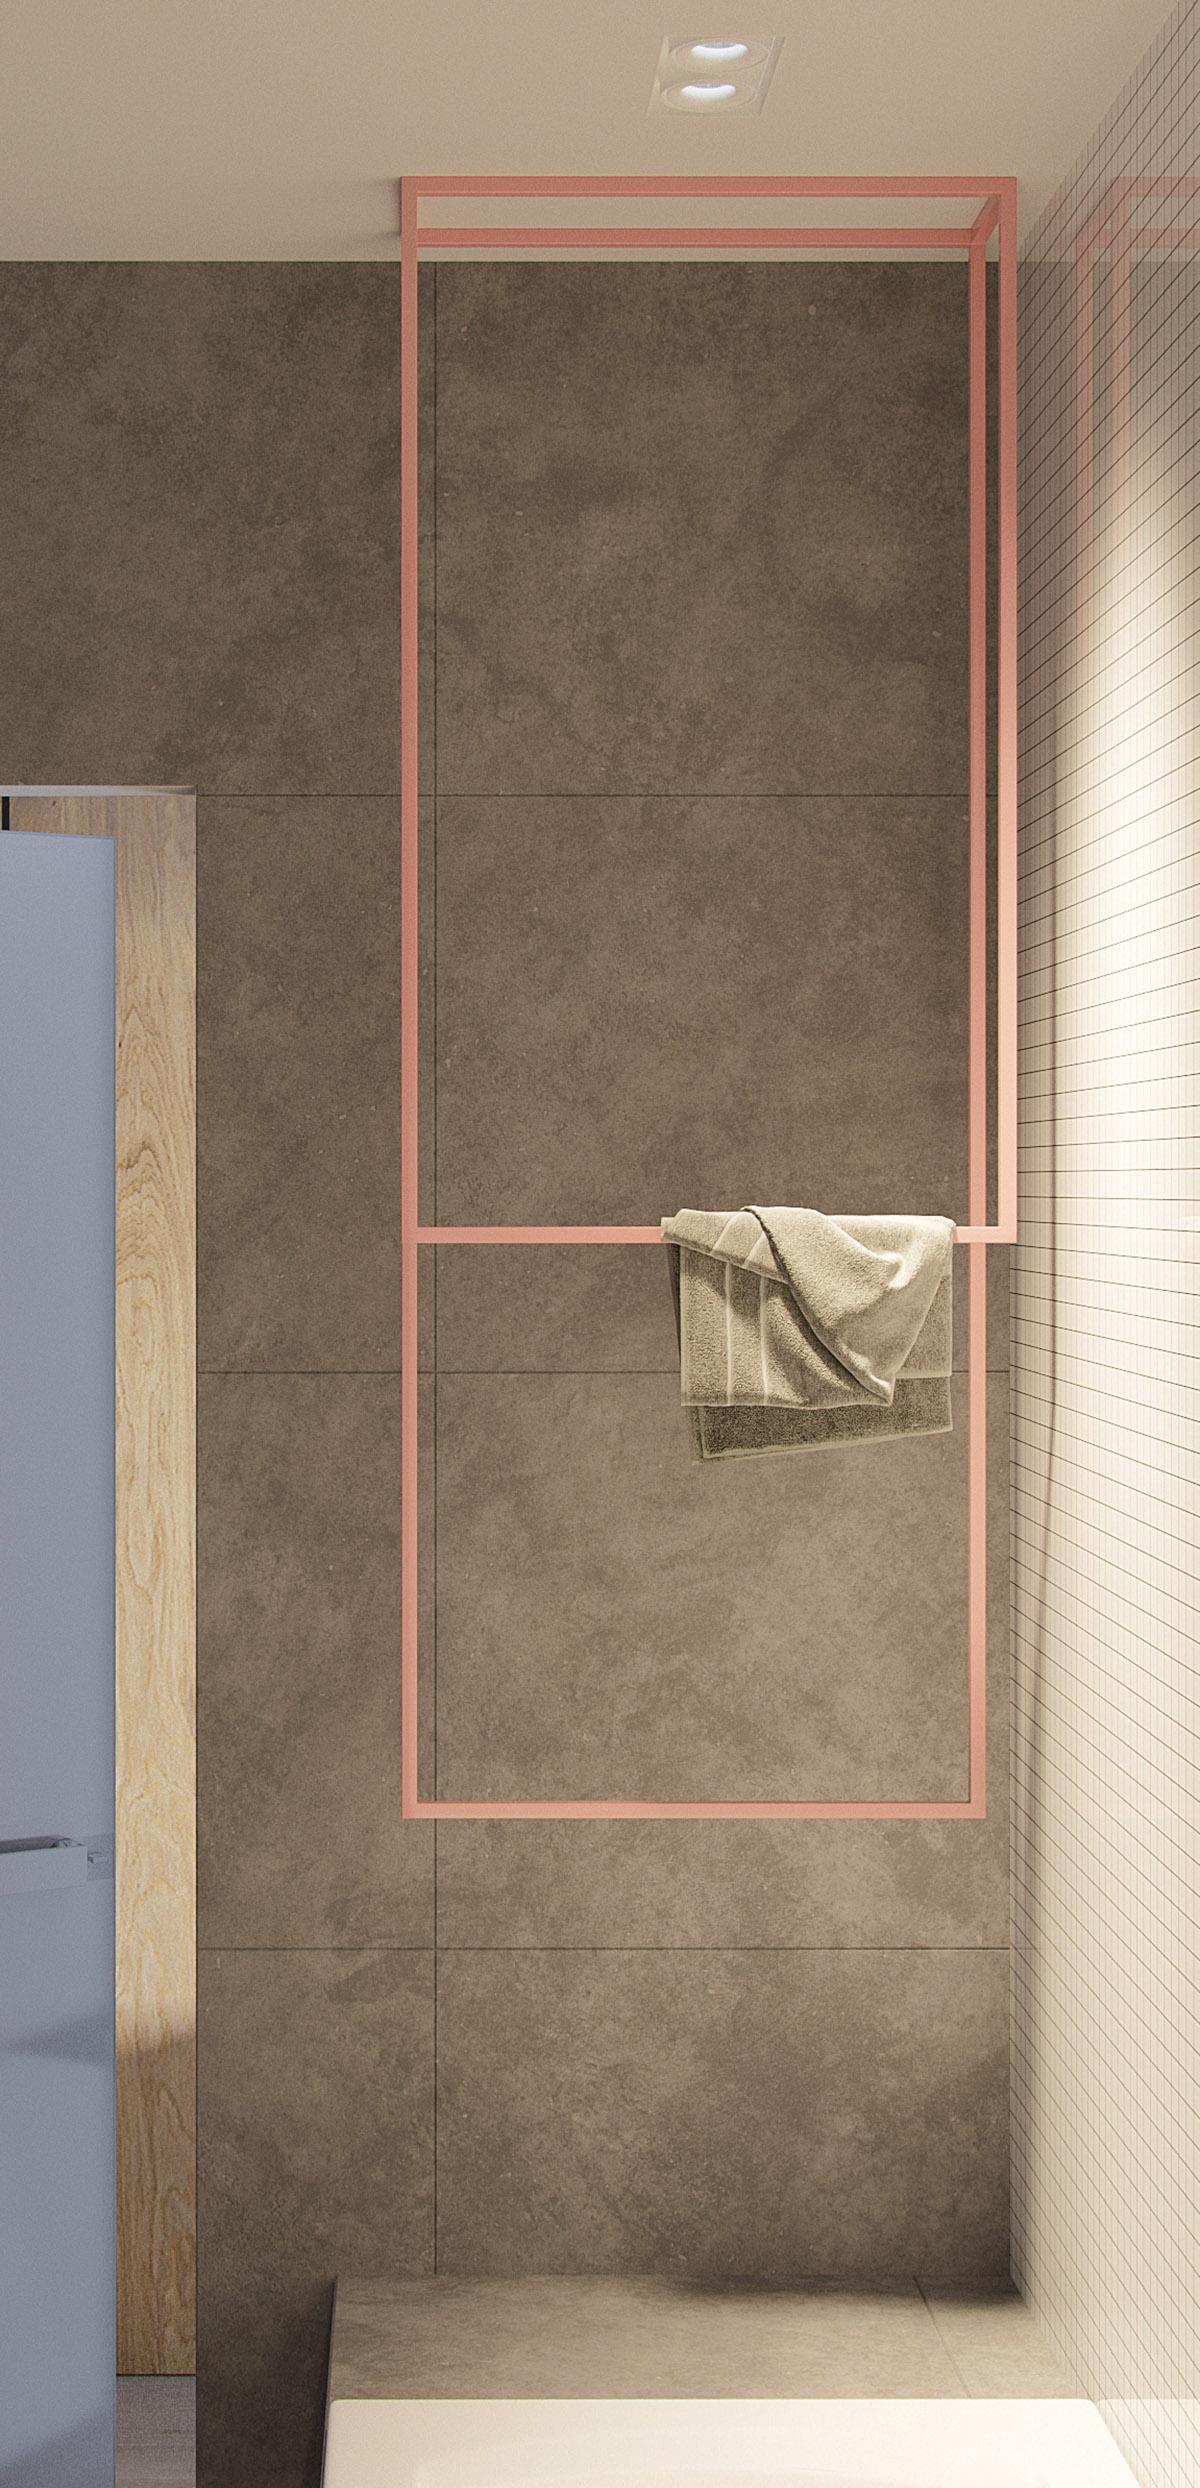 pink-towel-rail-600x1244.jpg